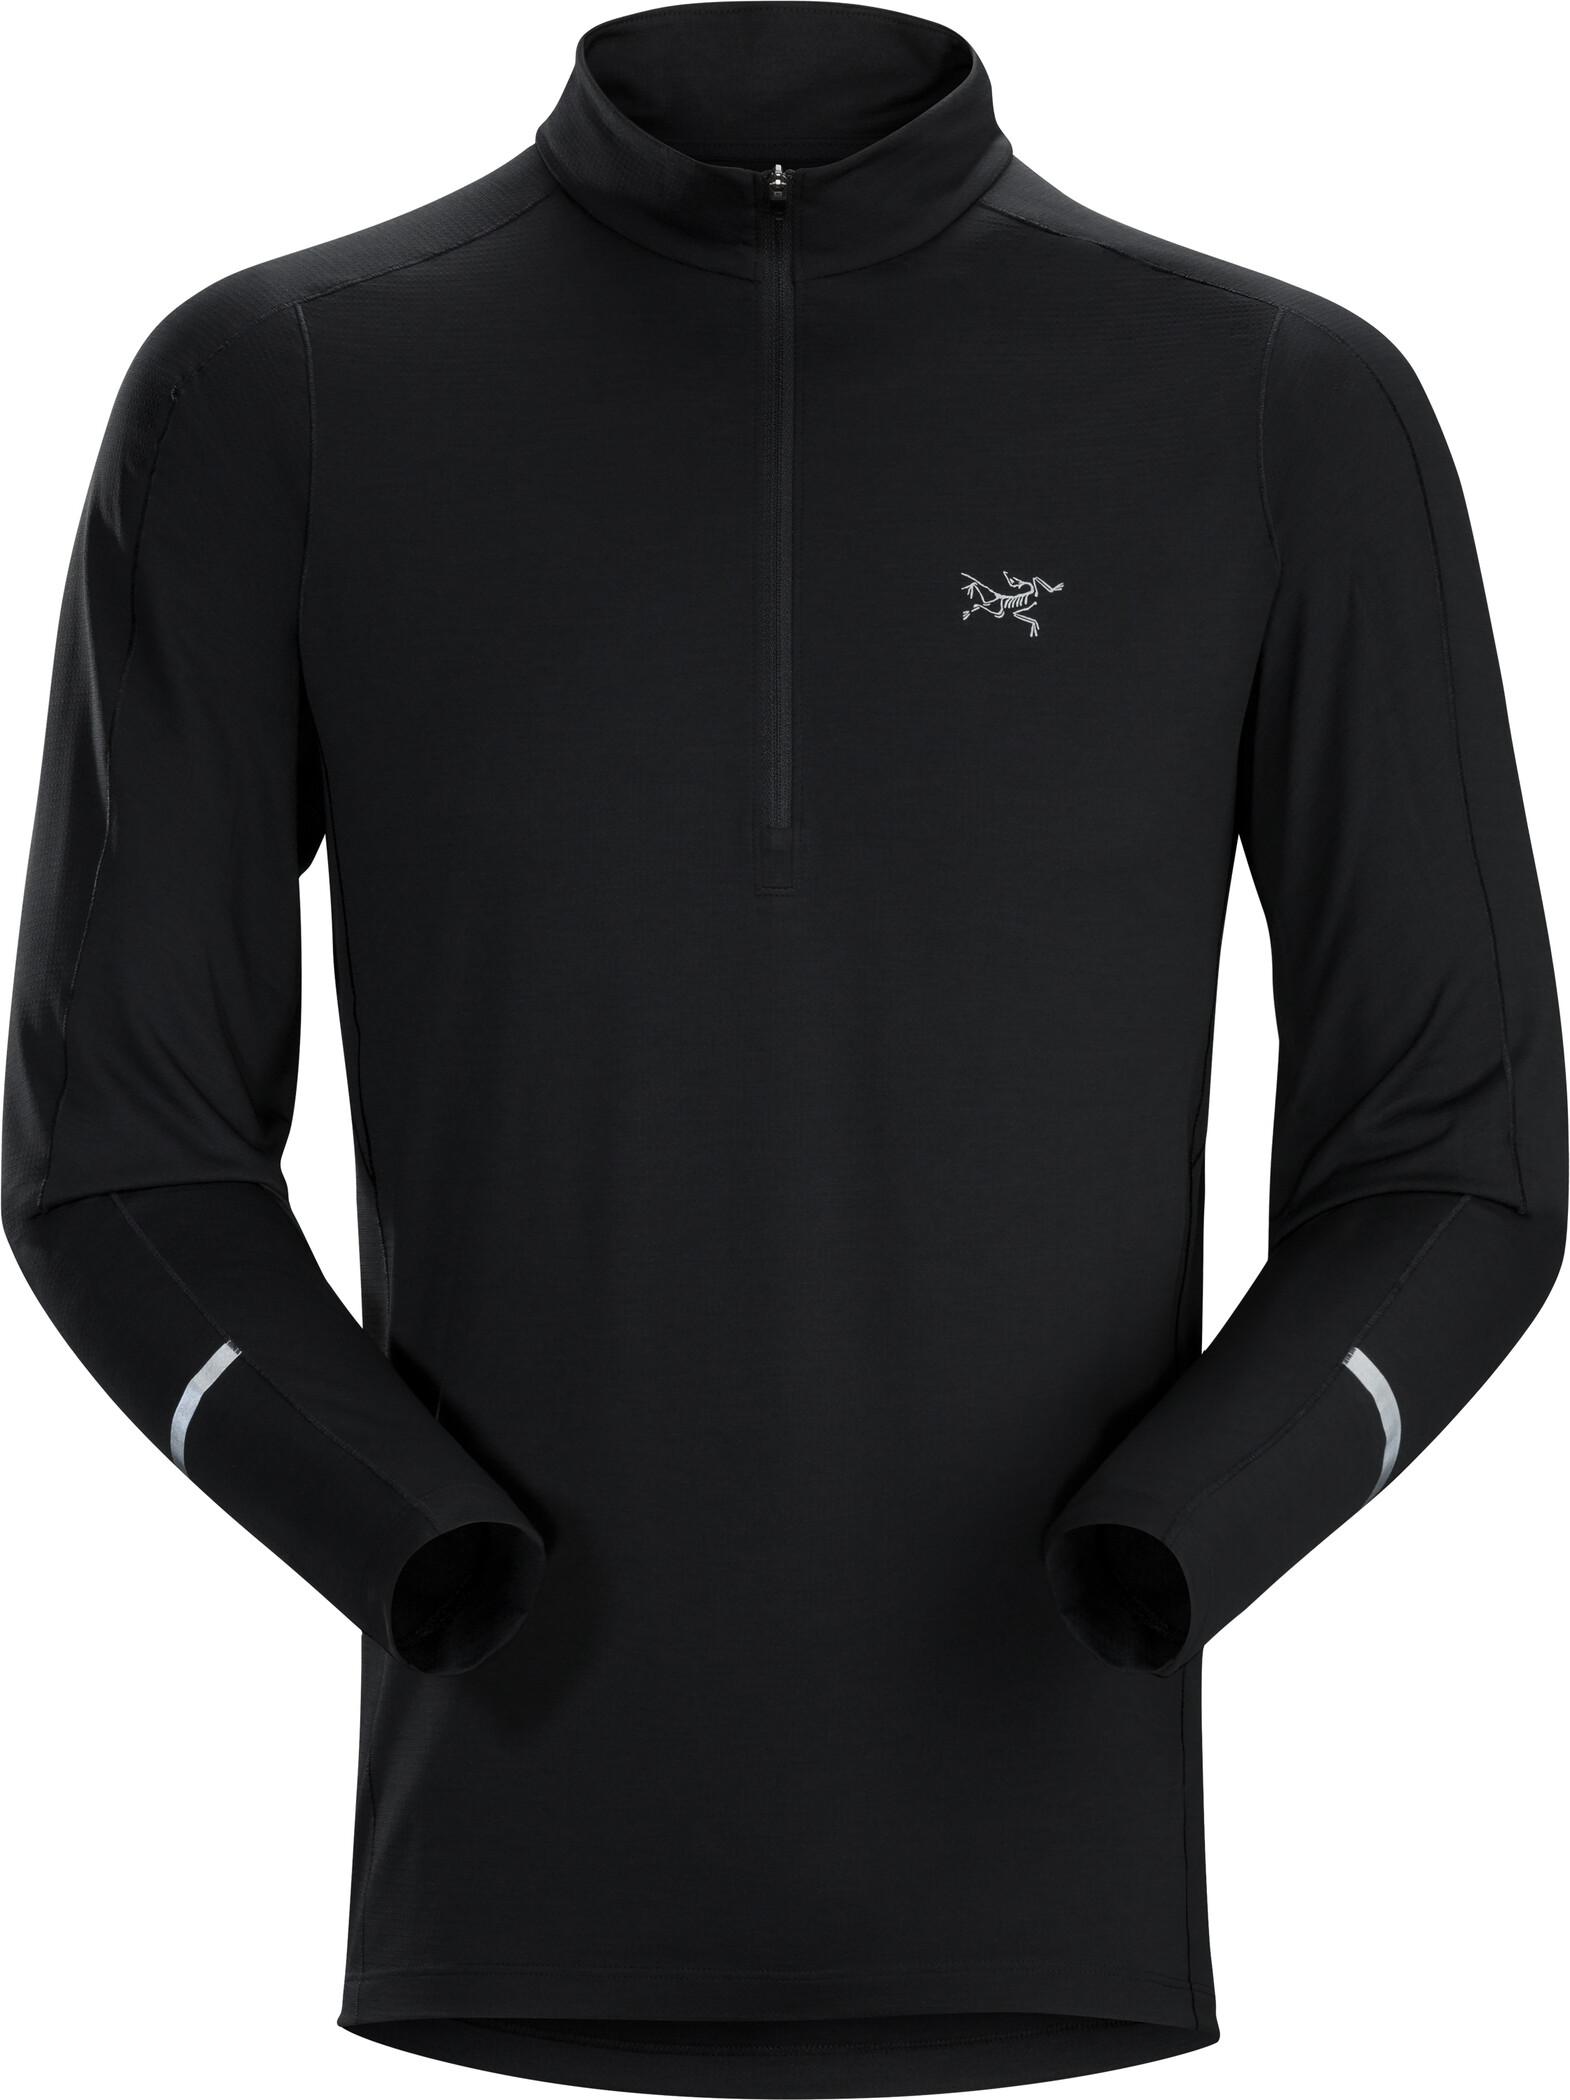 Arc'teryx Cormac Trøje m. lynlås Herrer, black (2019)   Jerseys